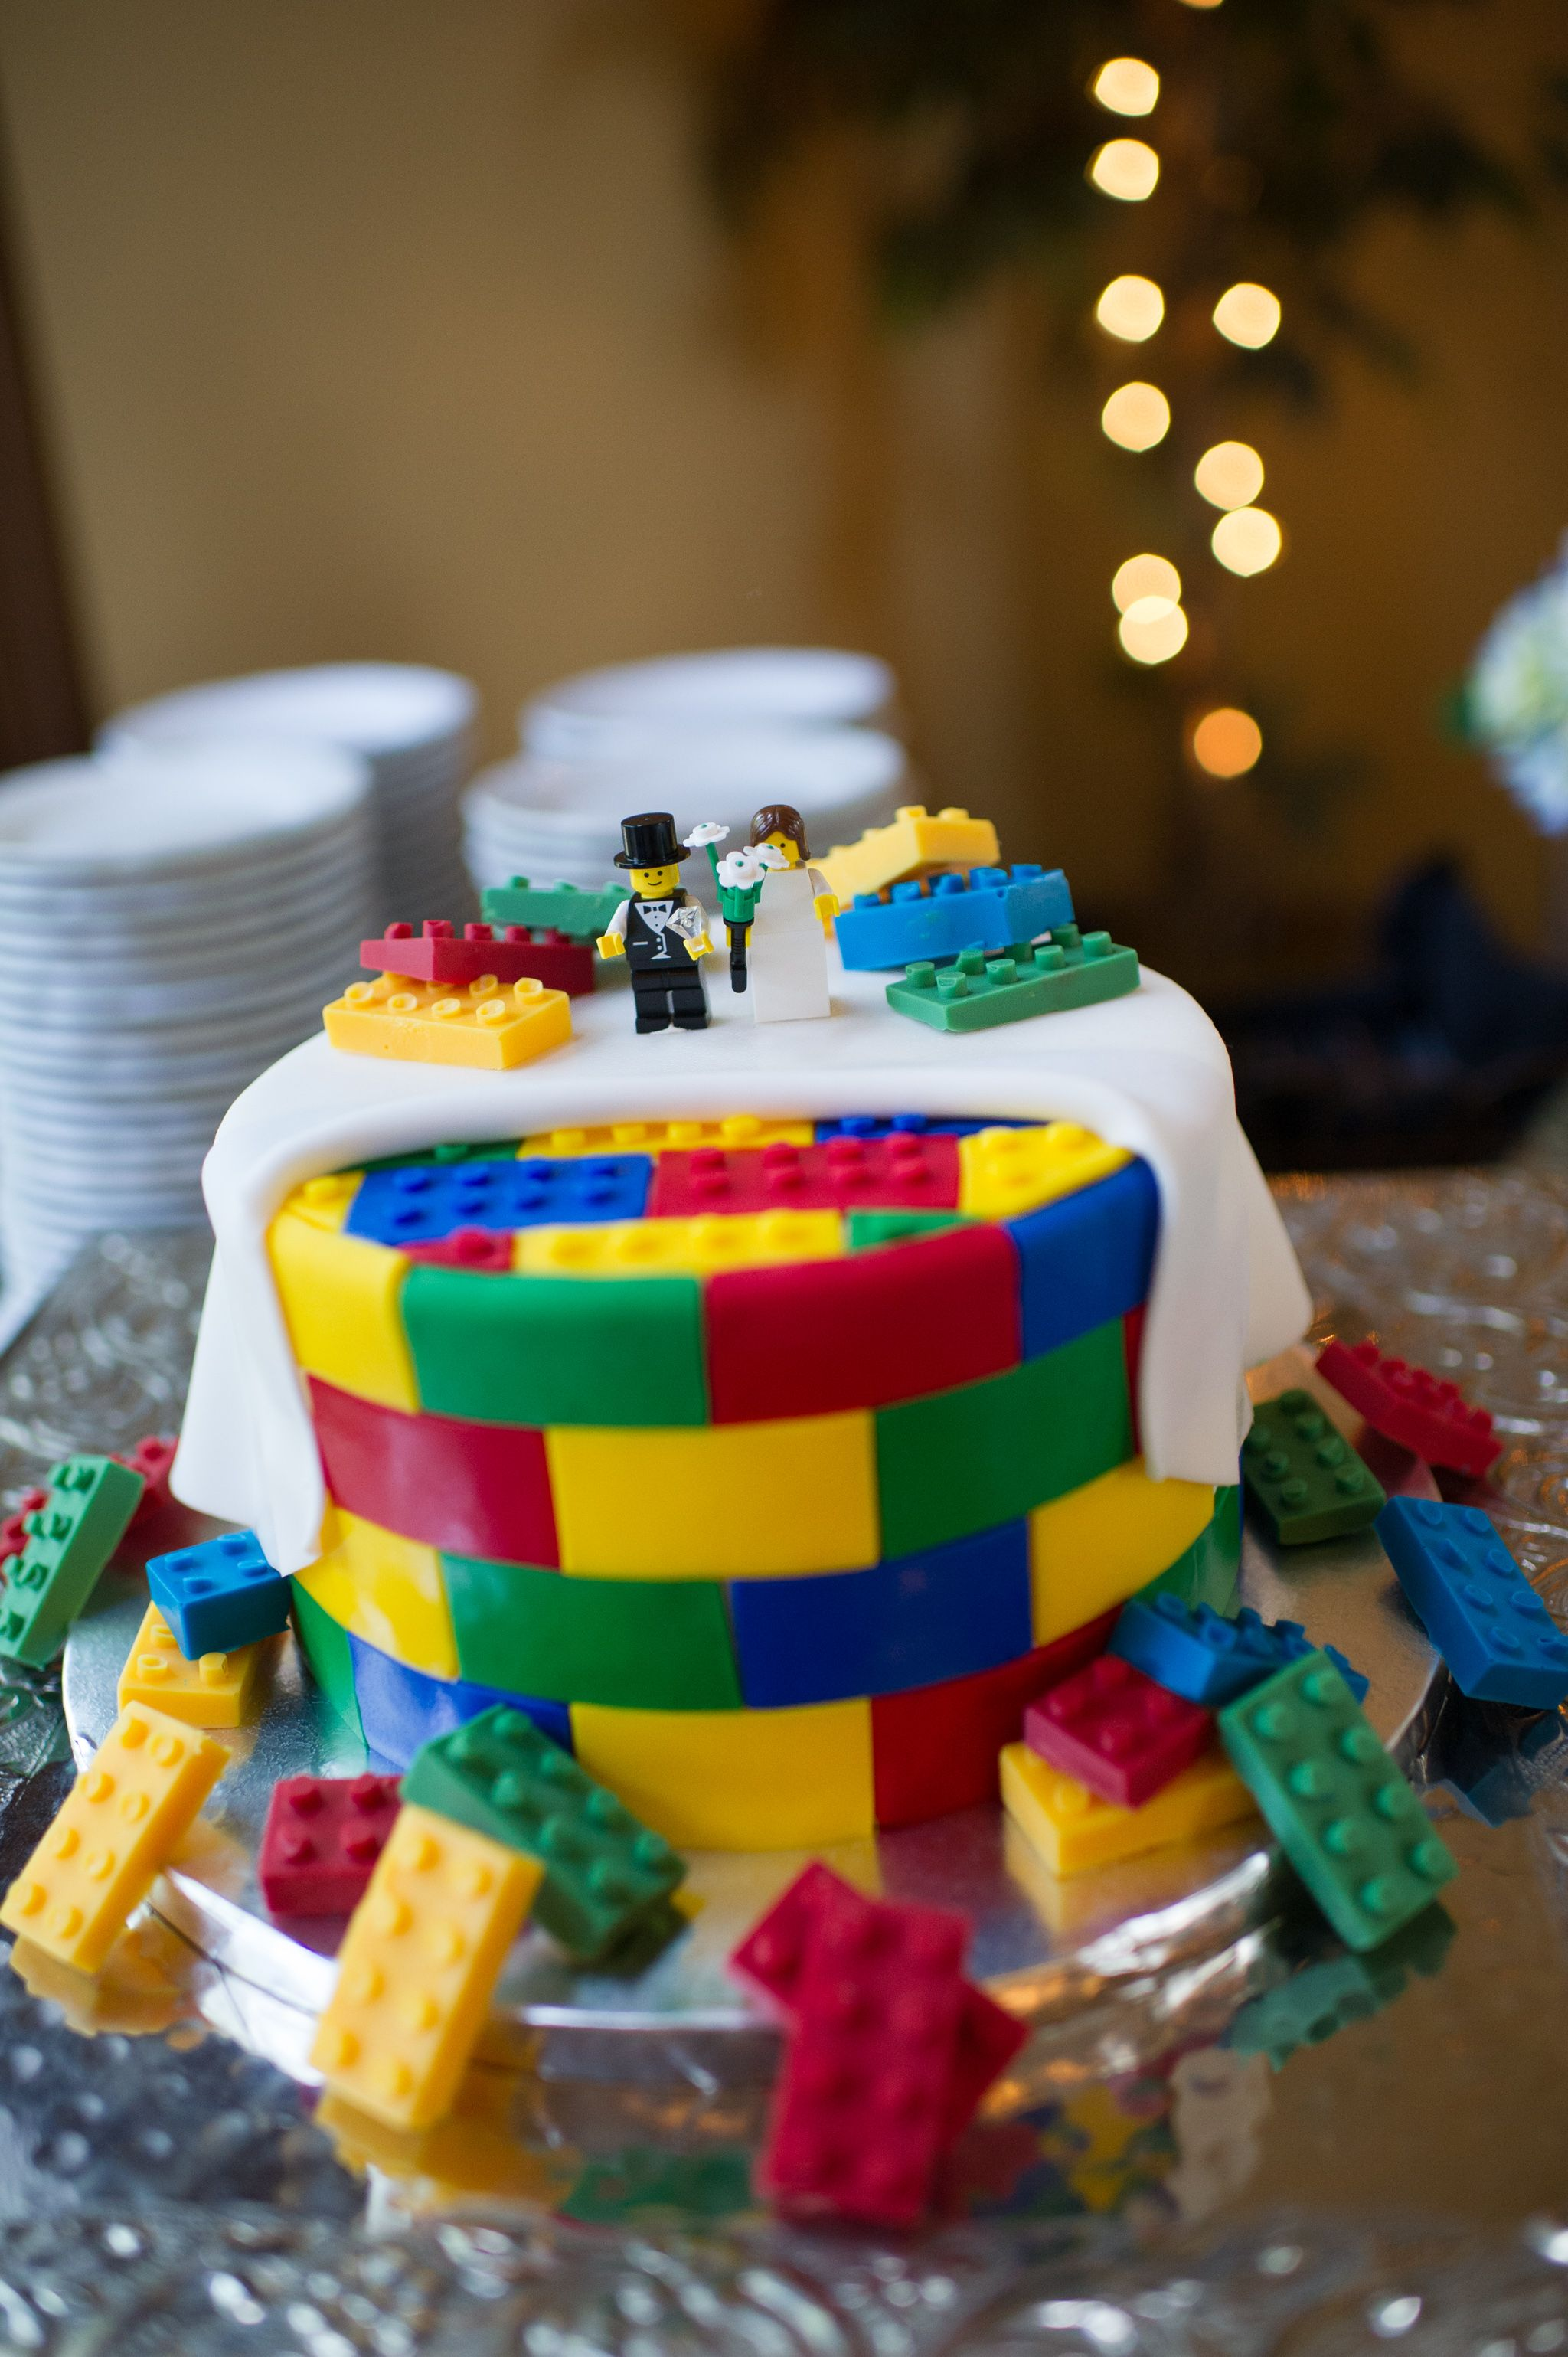 LEGO Grooms Cake So Cool Celebratory Cakes Pinterest Lego - Crazy cake designs lego grooms cake design